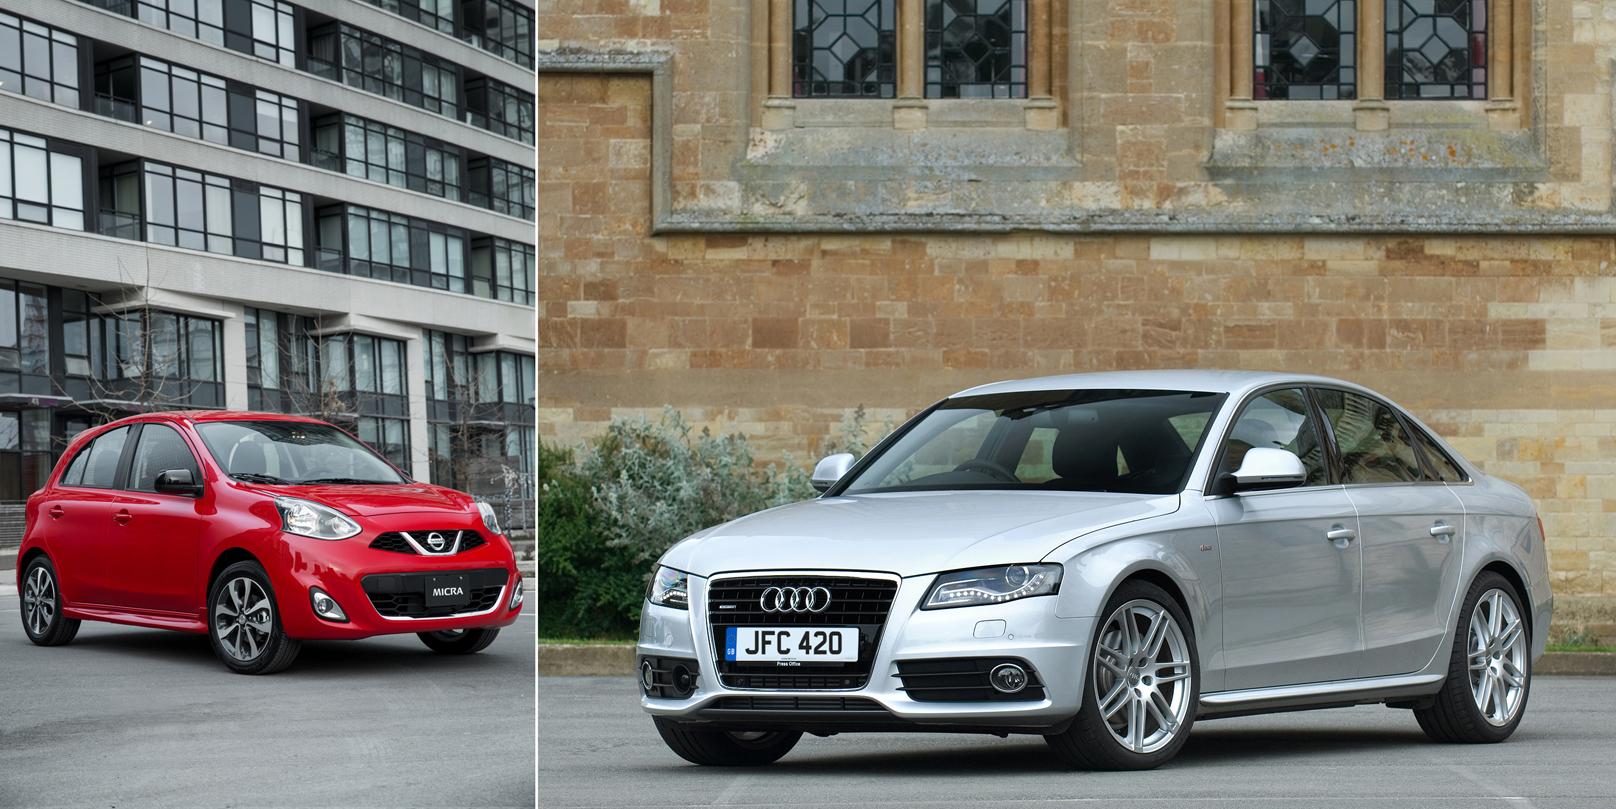 Nissan Micra vs Audi A4